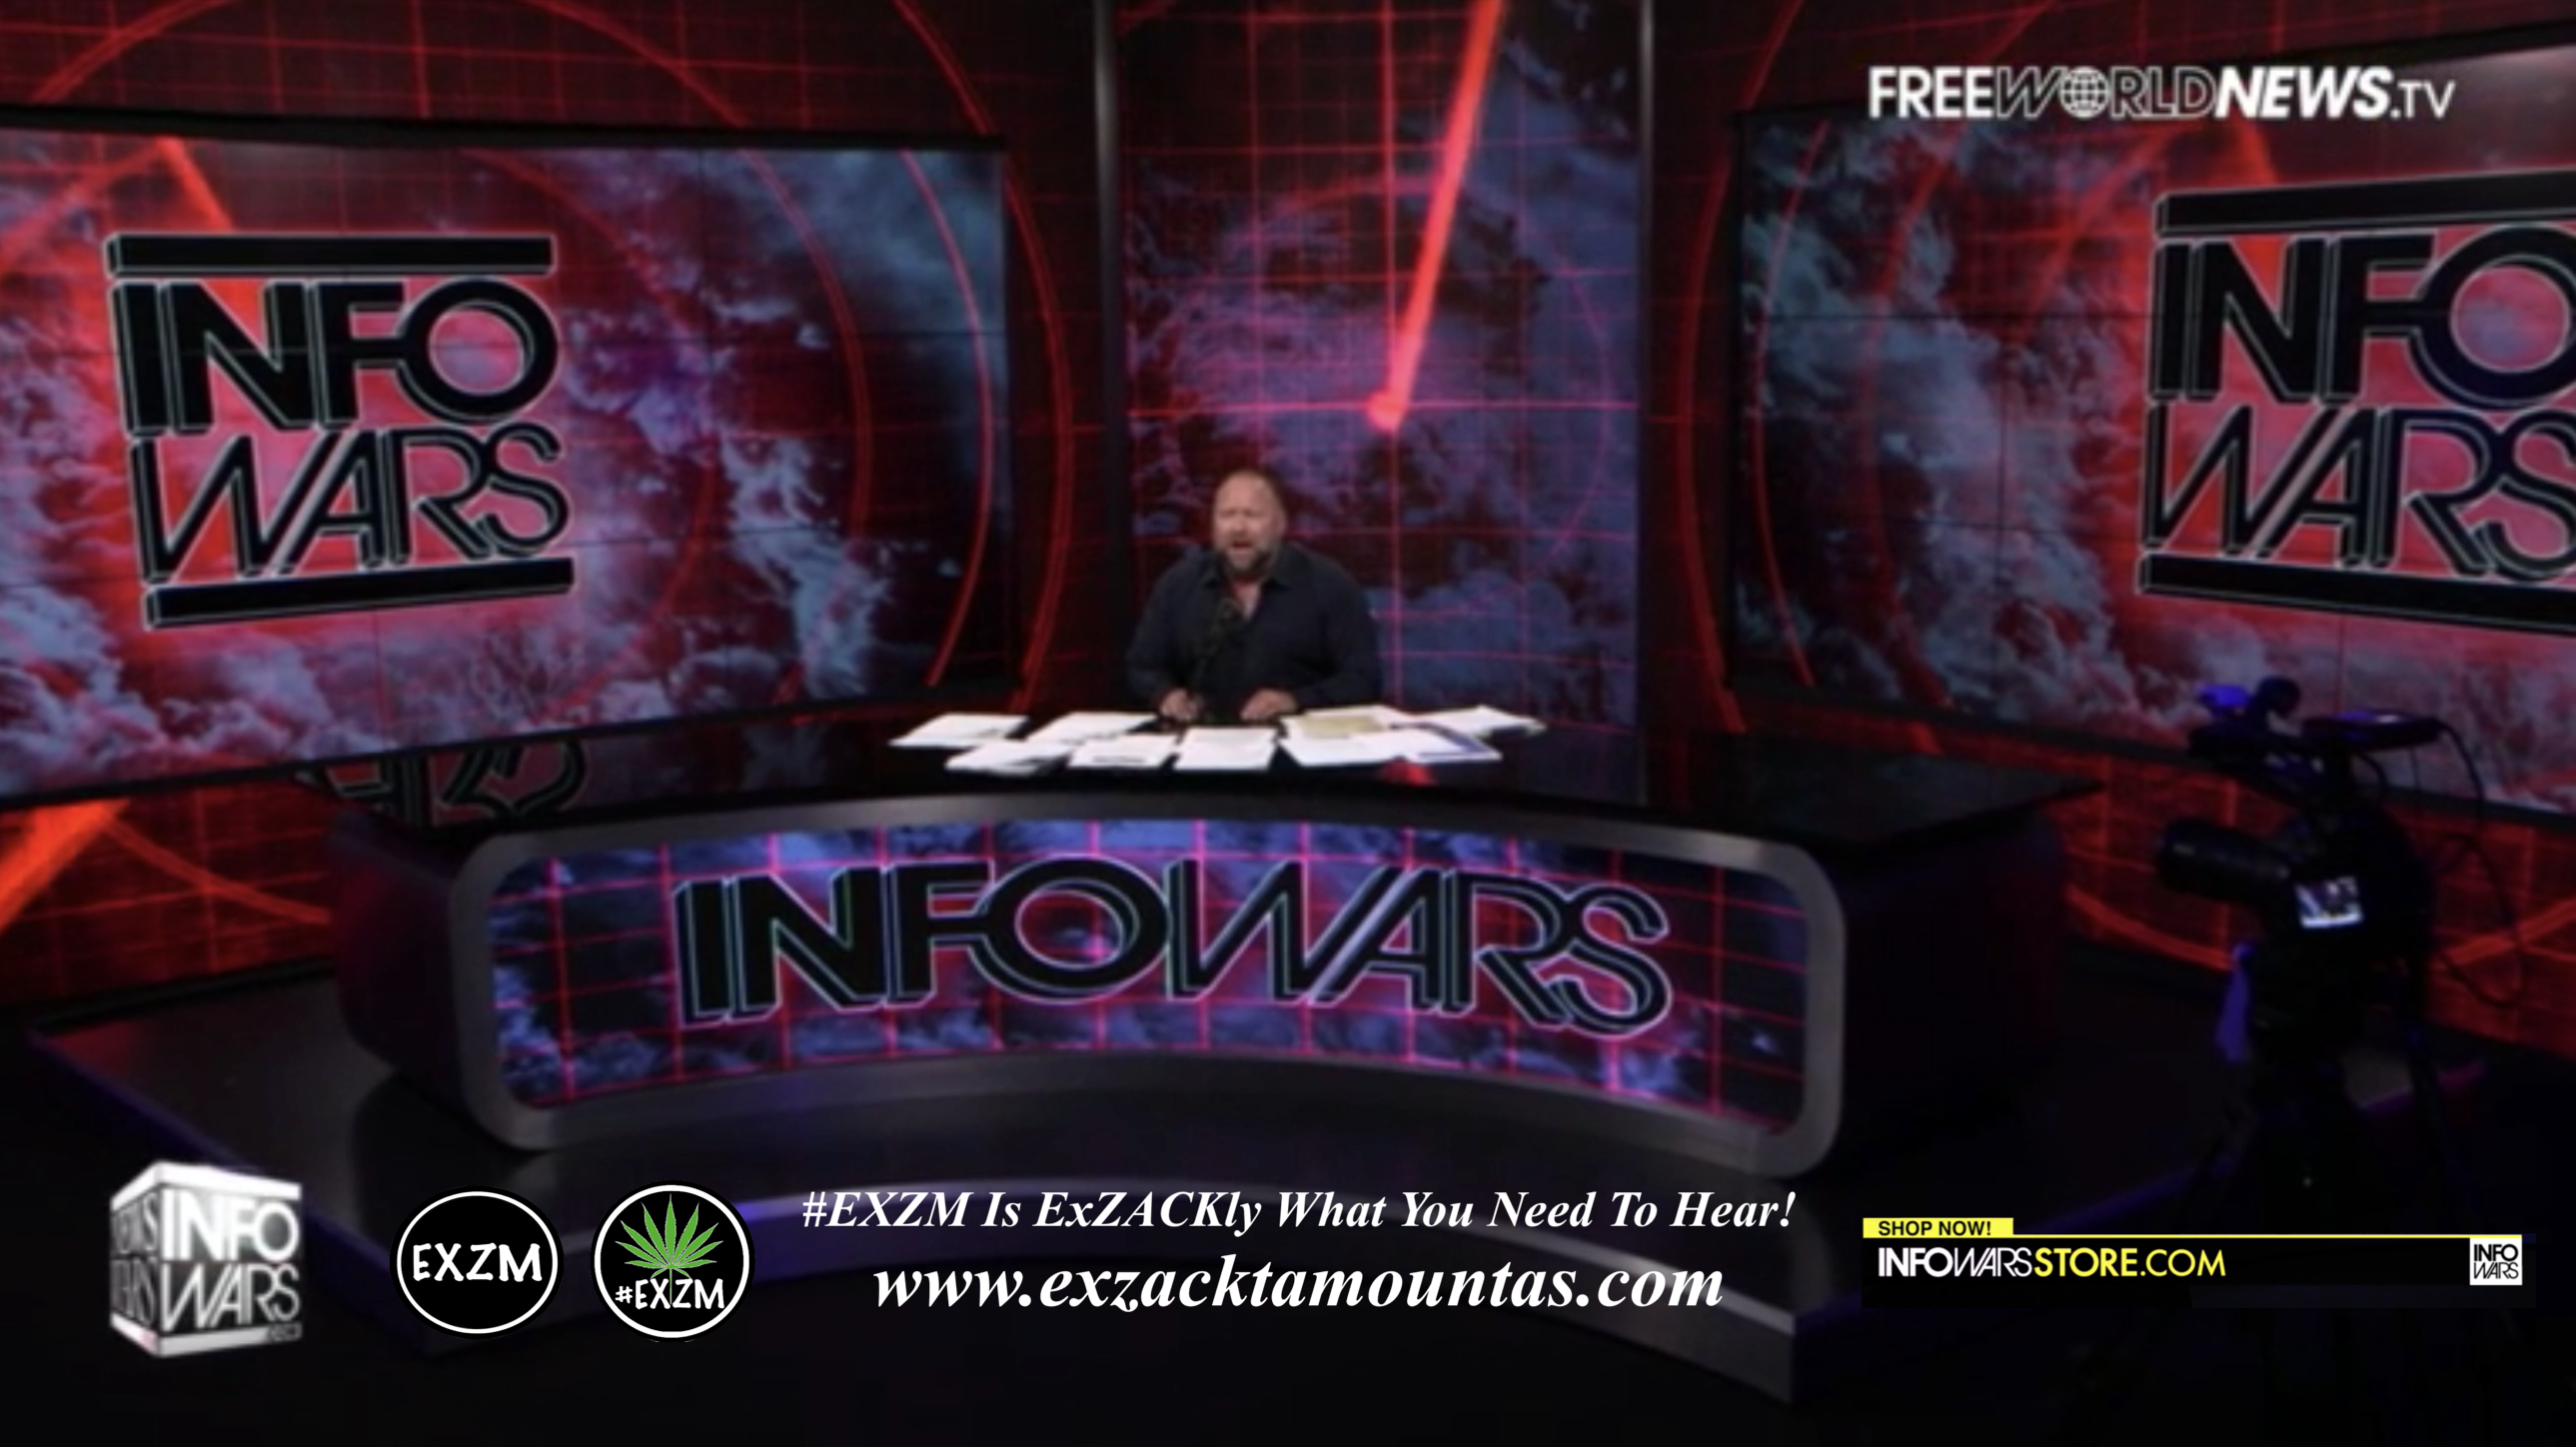 Alex Jones Live In Infowars Studio Free World News TV EXZM Zack Mount June 28th 2021 copy